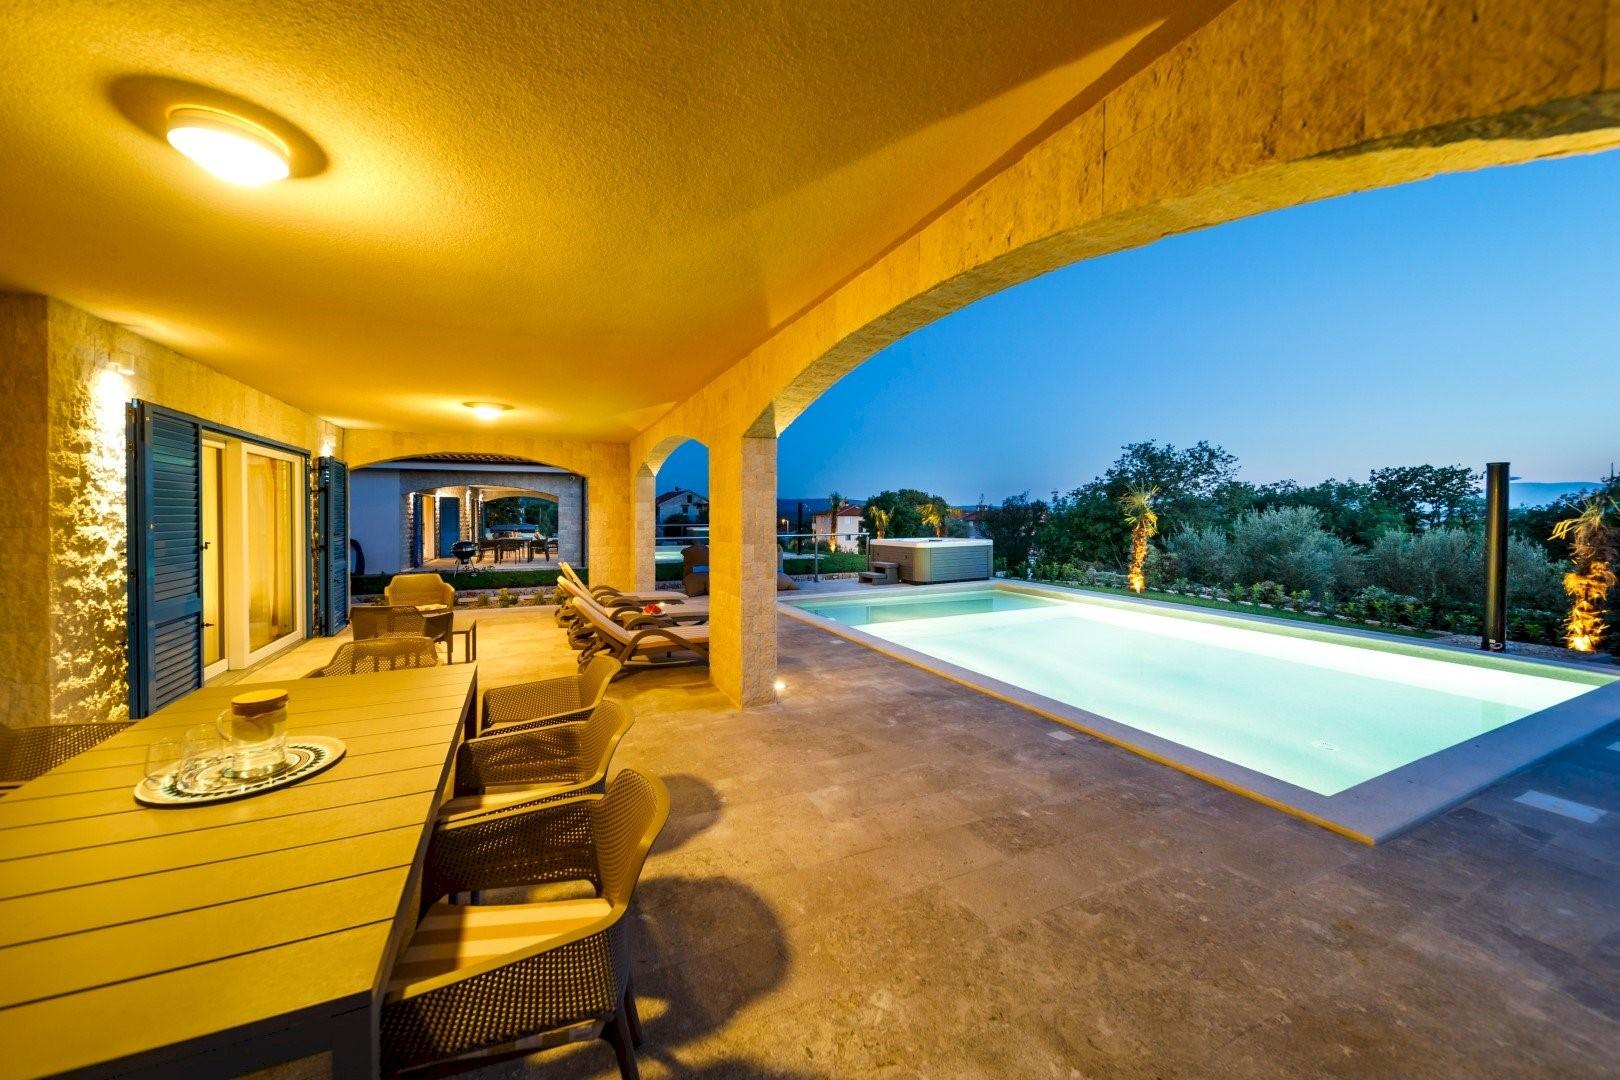 Ferienhaus Luxury Villa Loma 2 (2586643), Sveti Vid-Miholjice, Insel Krk, Kvarner, Kroatien, Bild 17